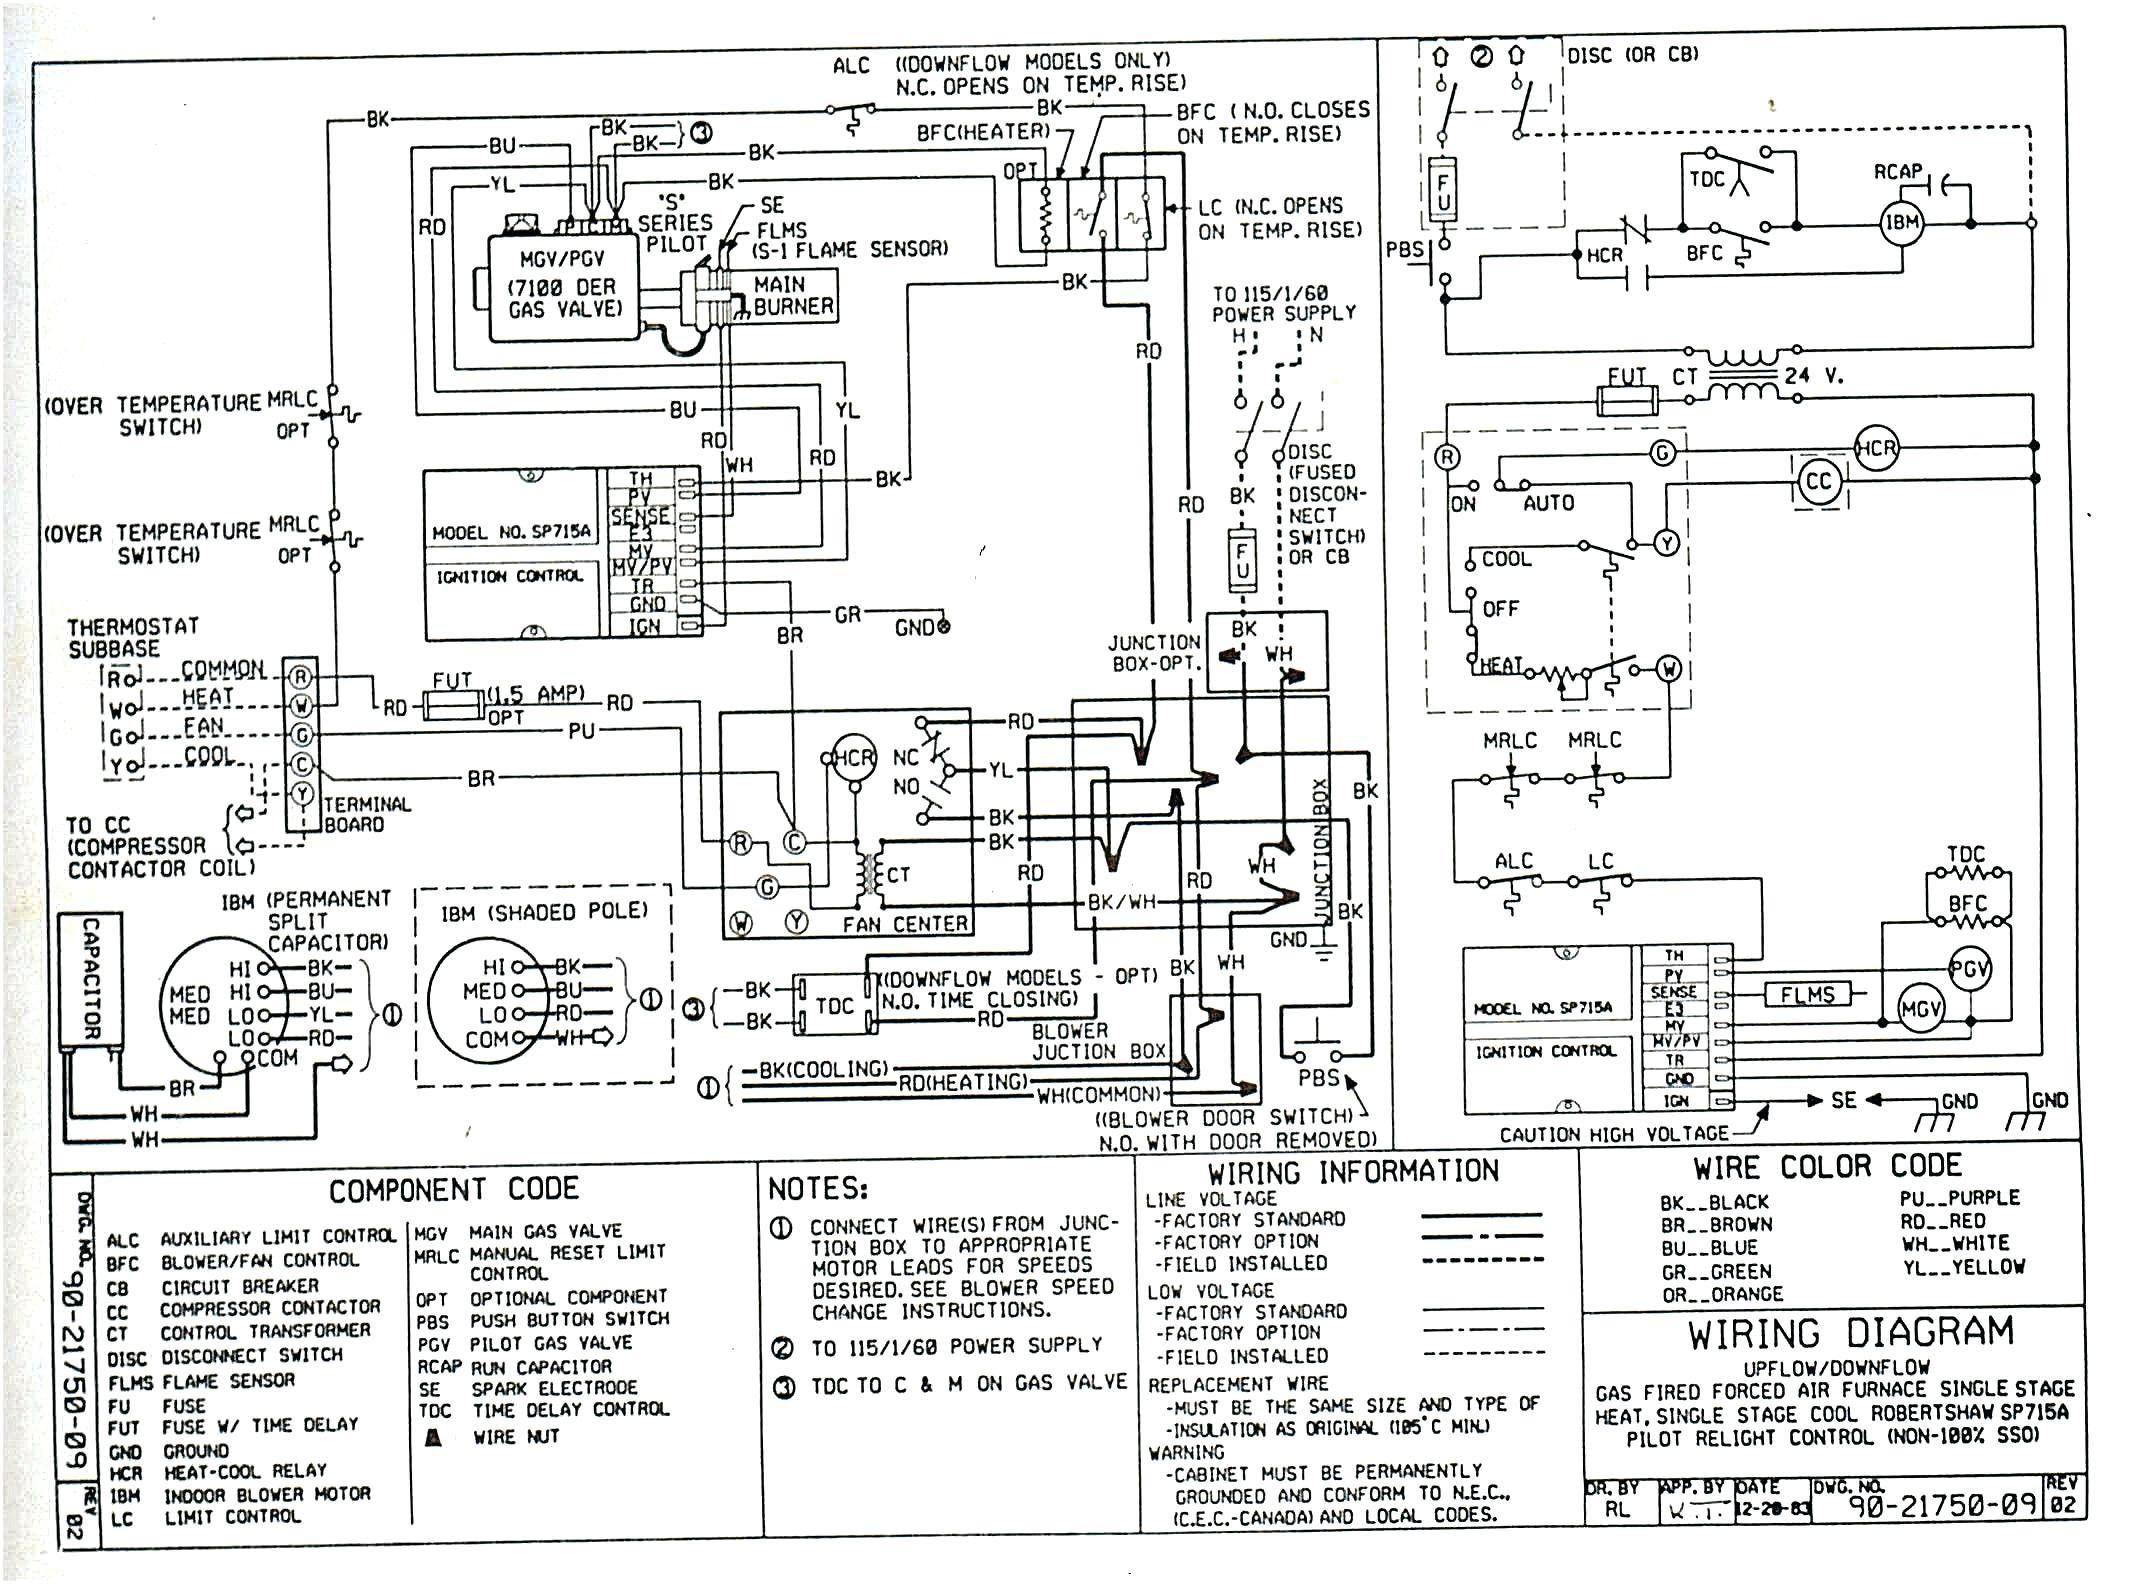 New Fire Alarm System Wiring Diagram Pdf Electrical Diagram Trailer Wiring Diagram Diagram